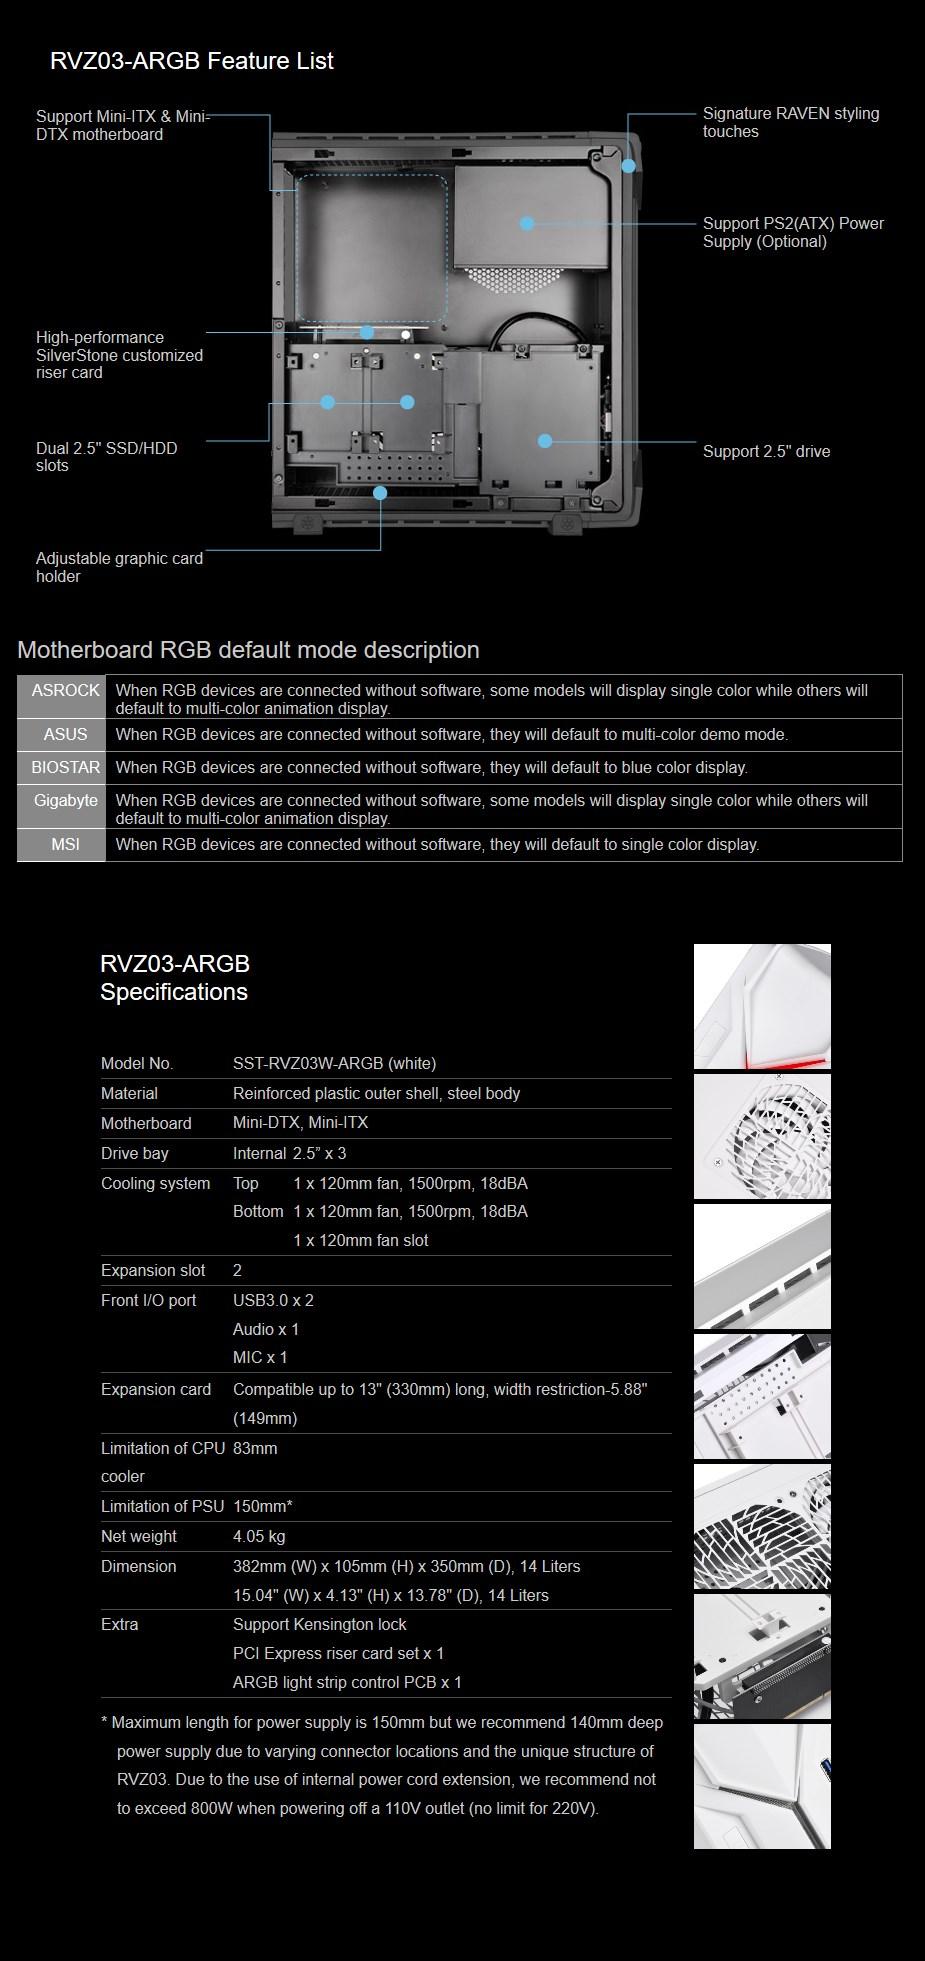 SilverStone Raven RVZ03 ARGB Mini ITX Case - White - Desktop Overview 1